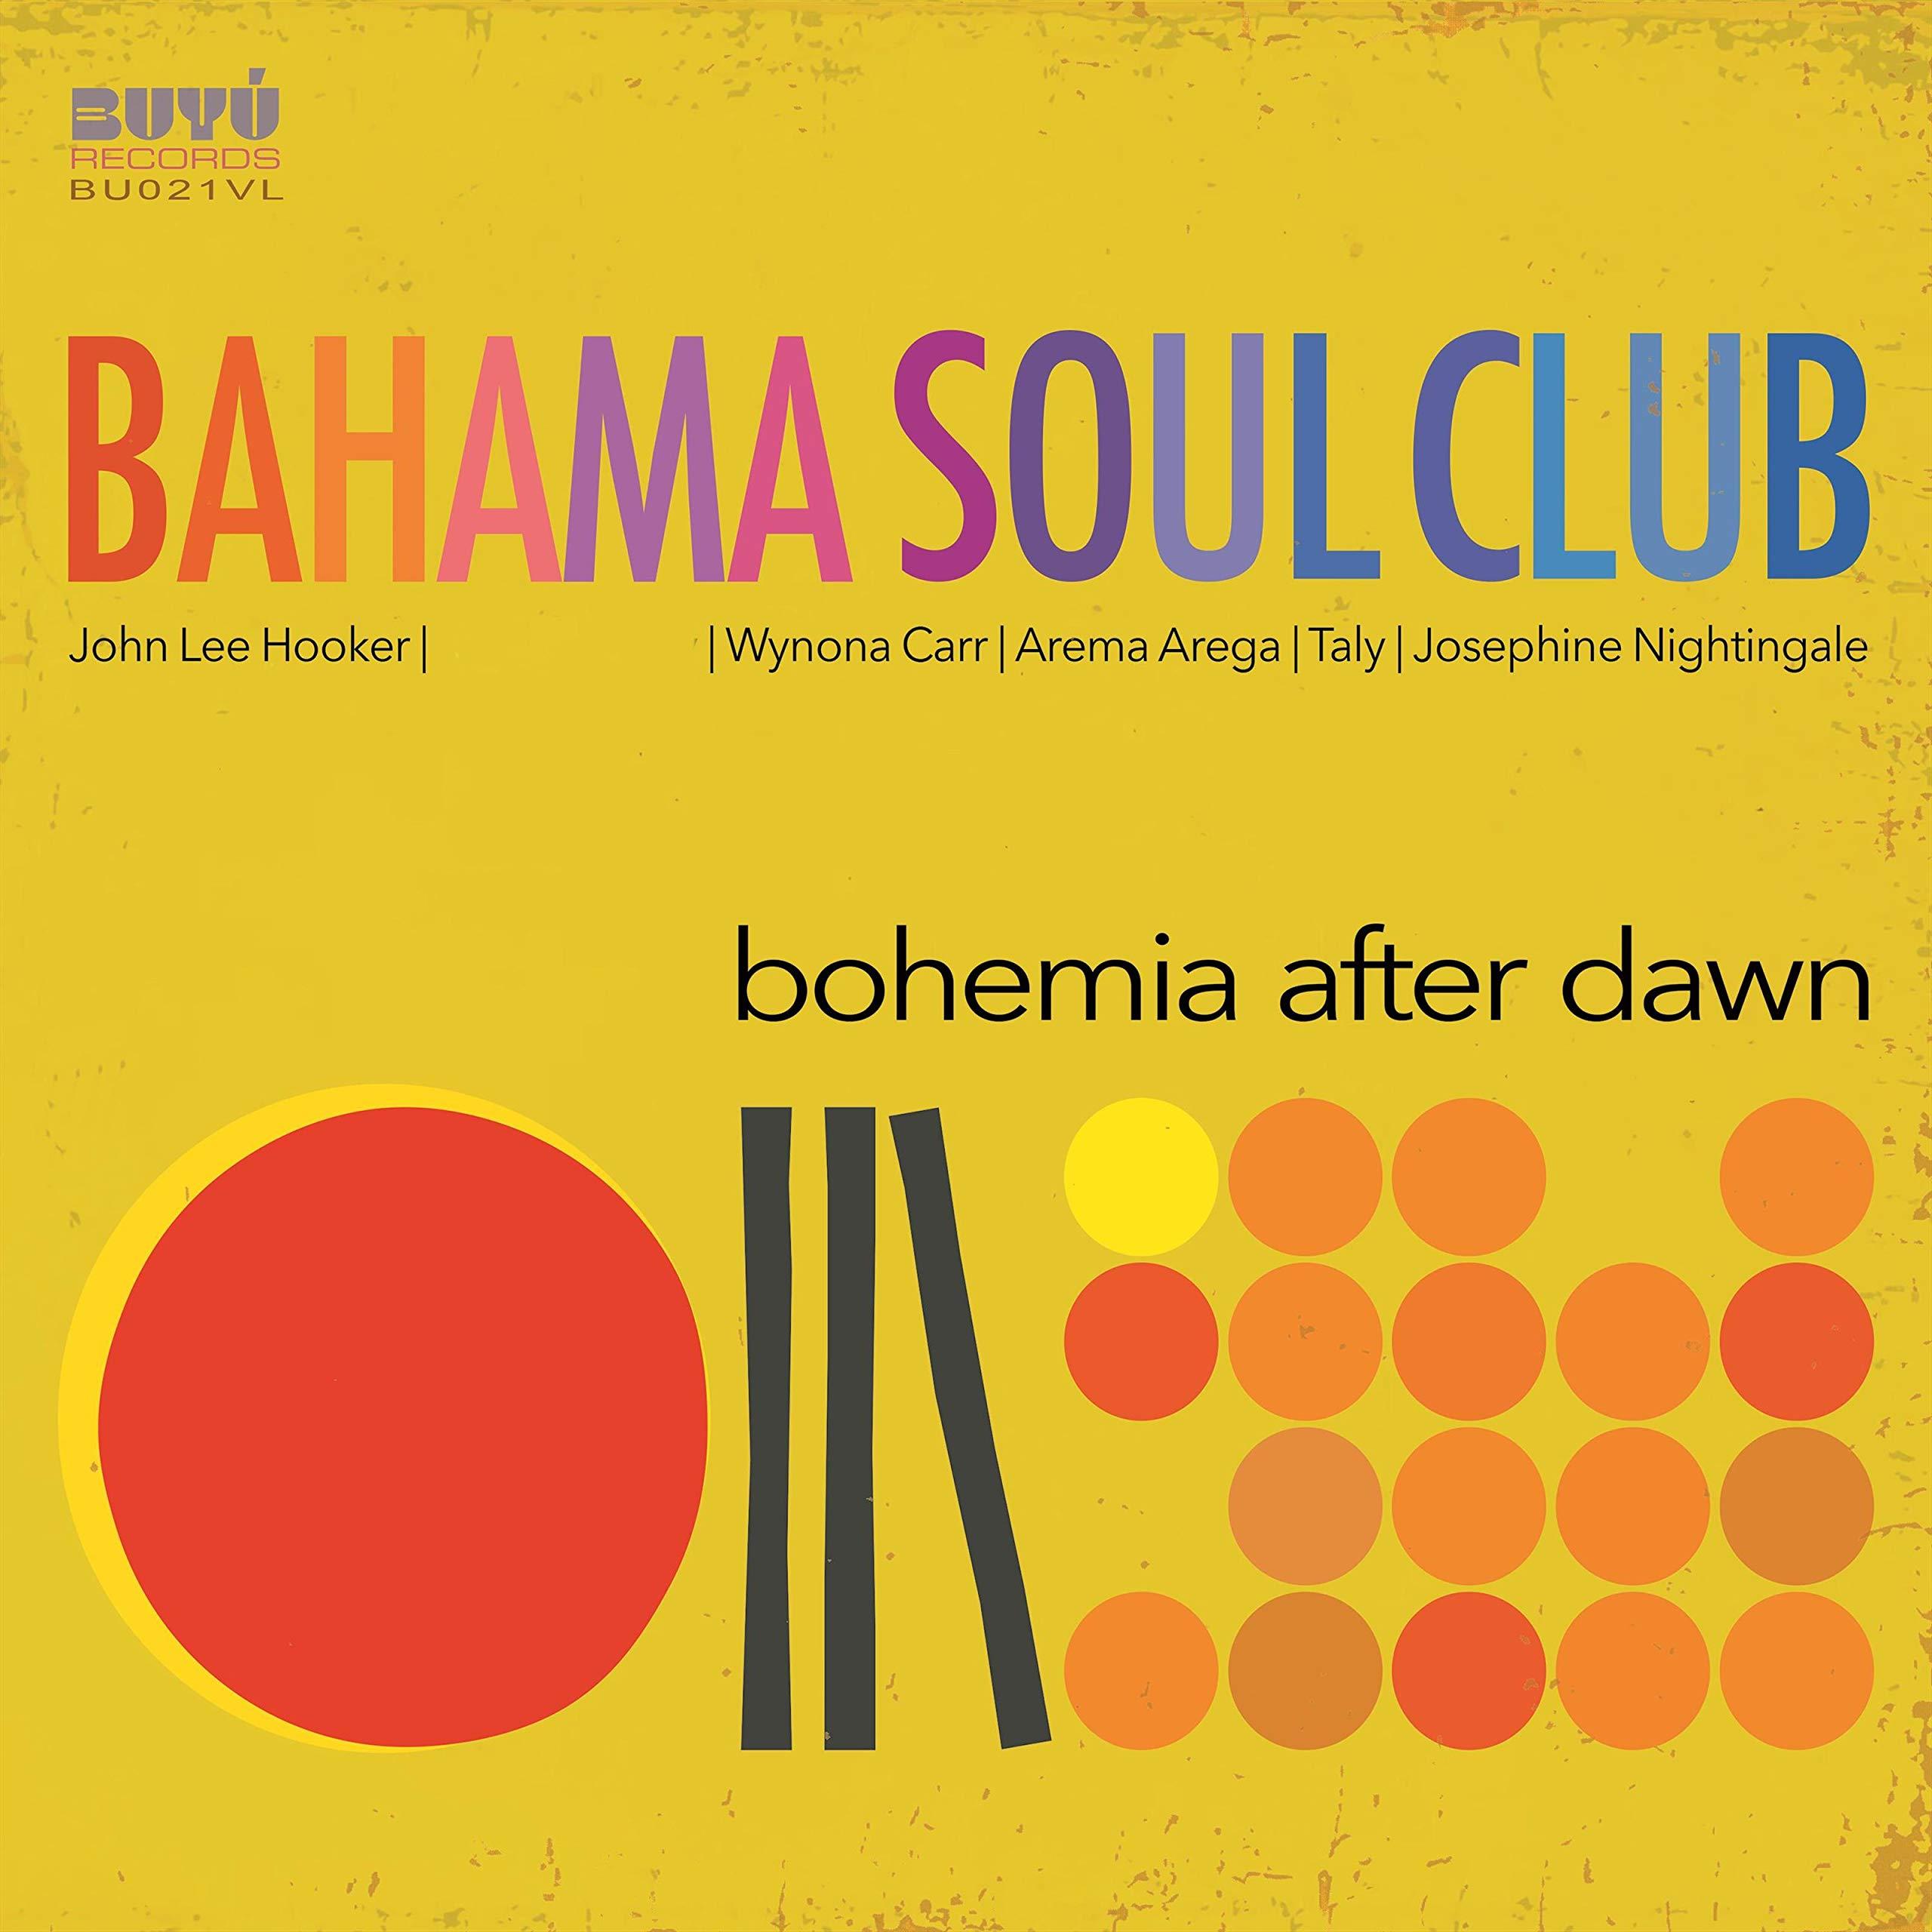 Bahama Soul Club - Bohemia After Dawn (2020) [FLAC] Download